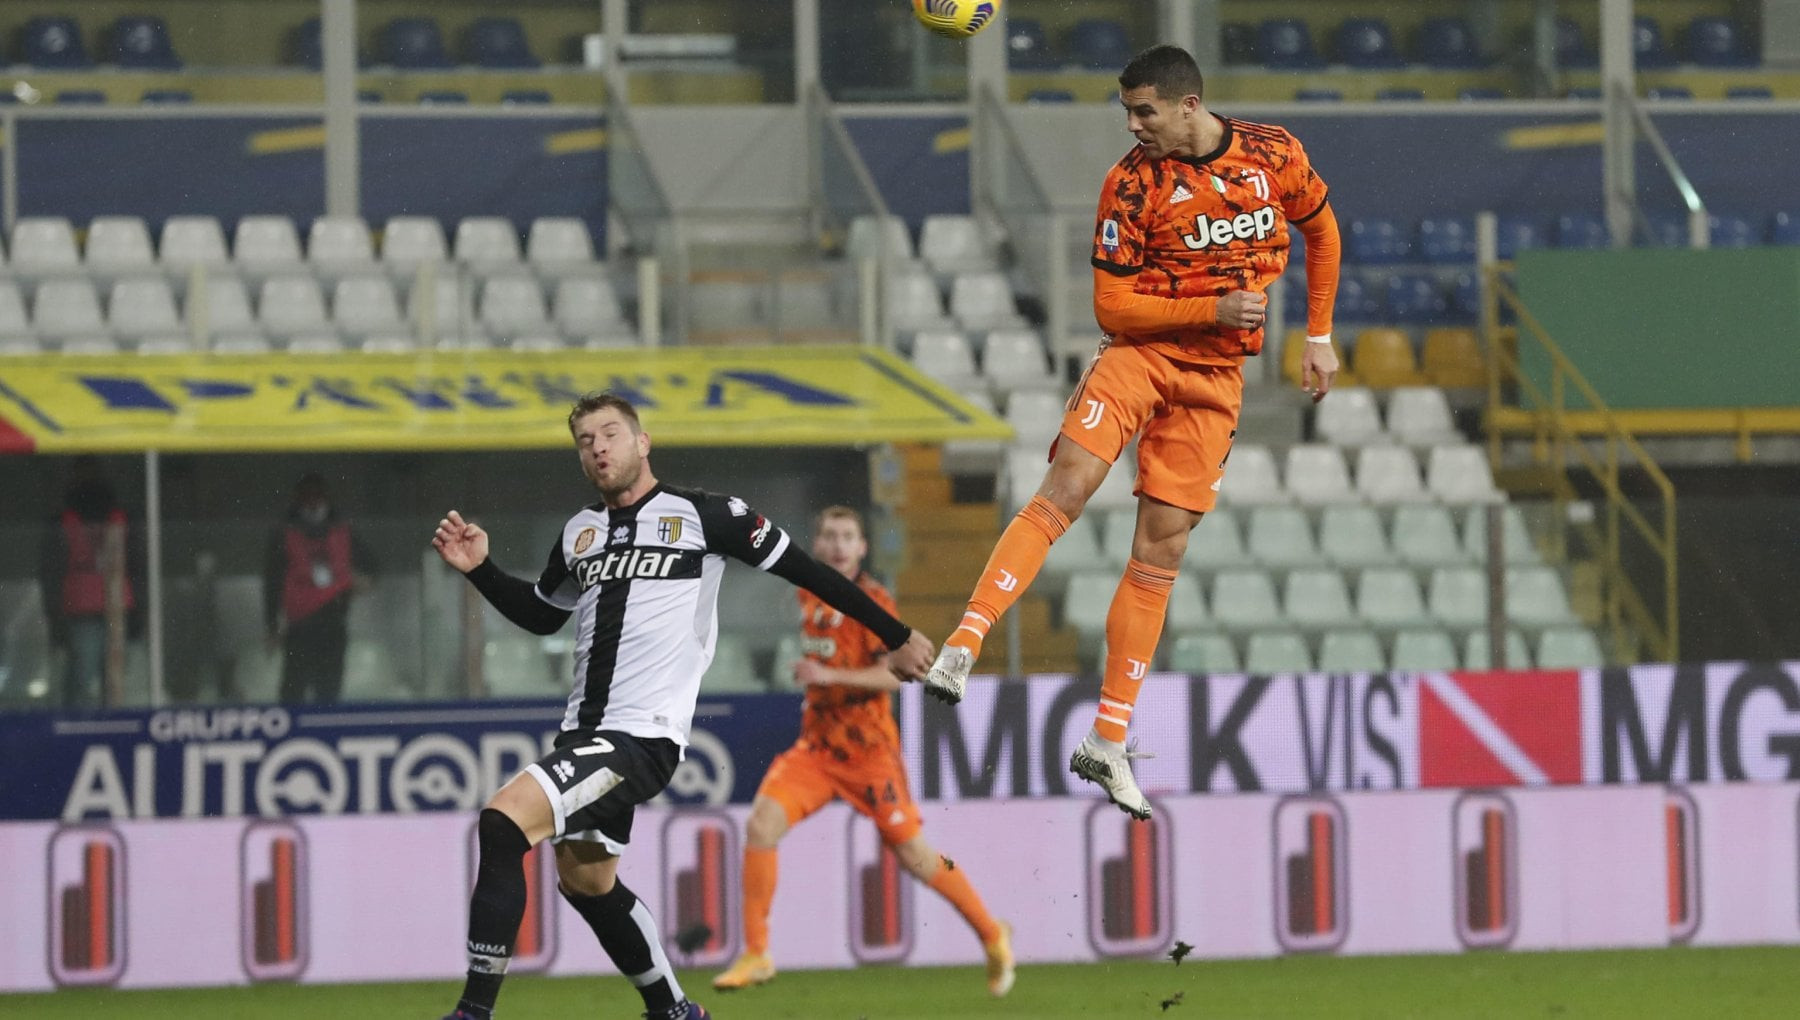 Parma Juventus 0 4 Ronaldo si riprende subito la scena